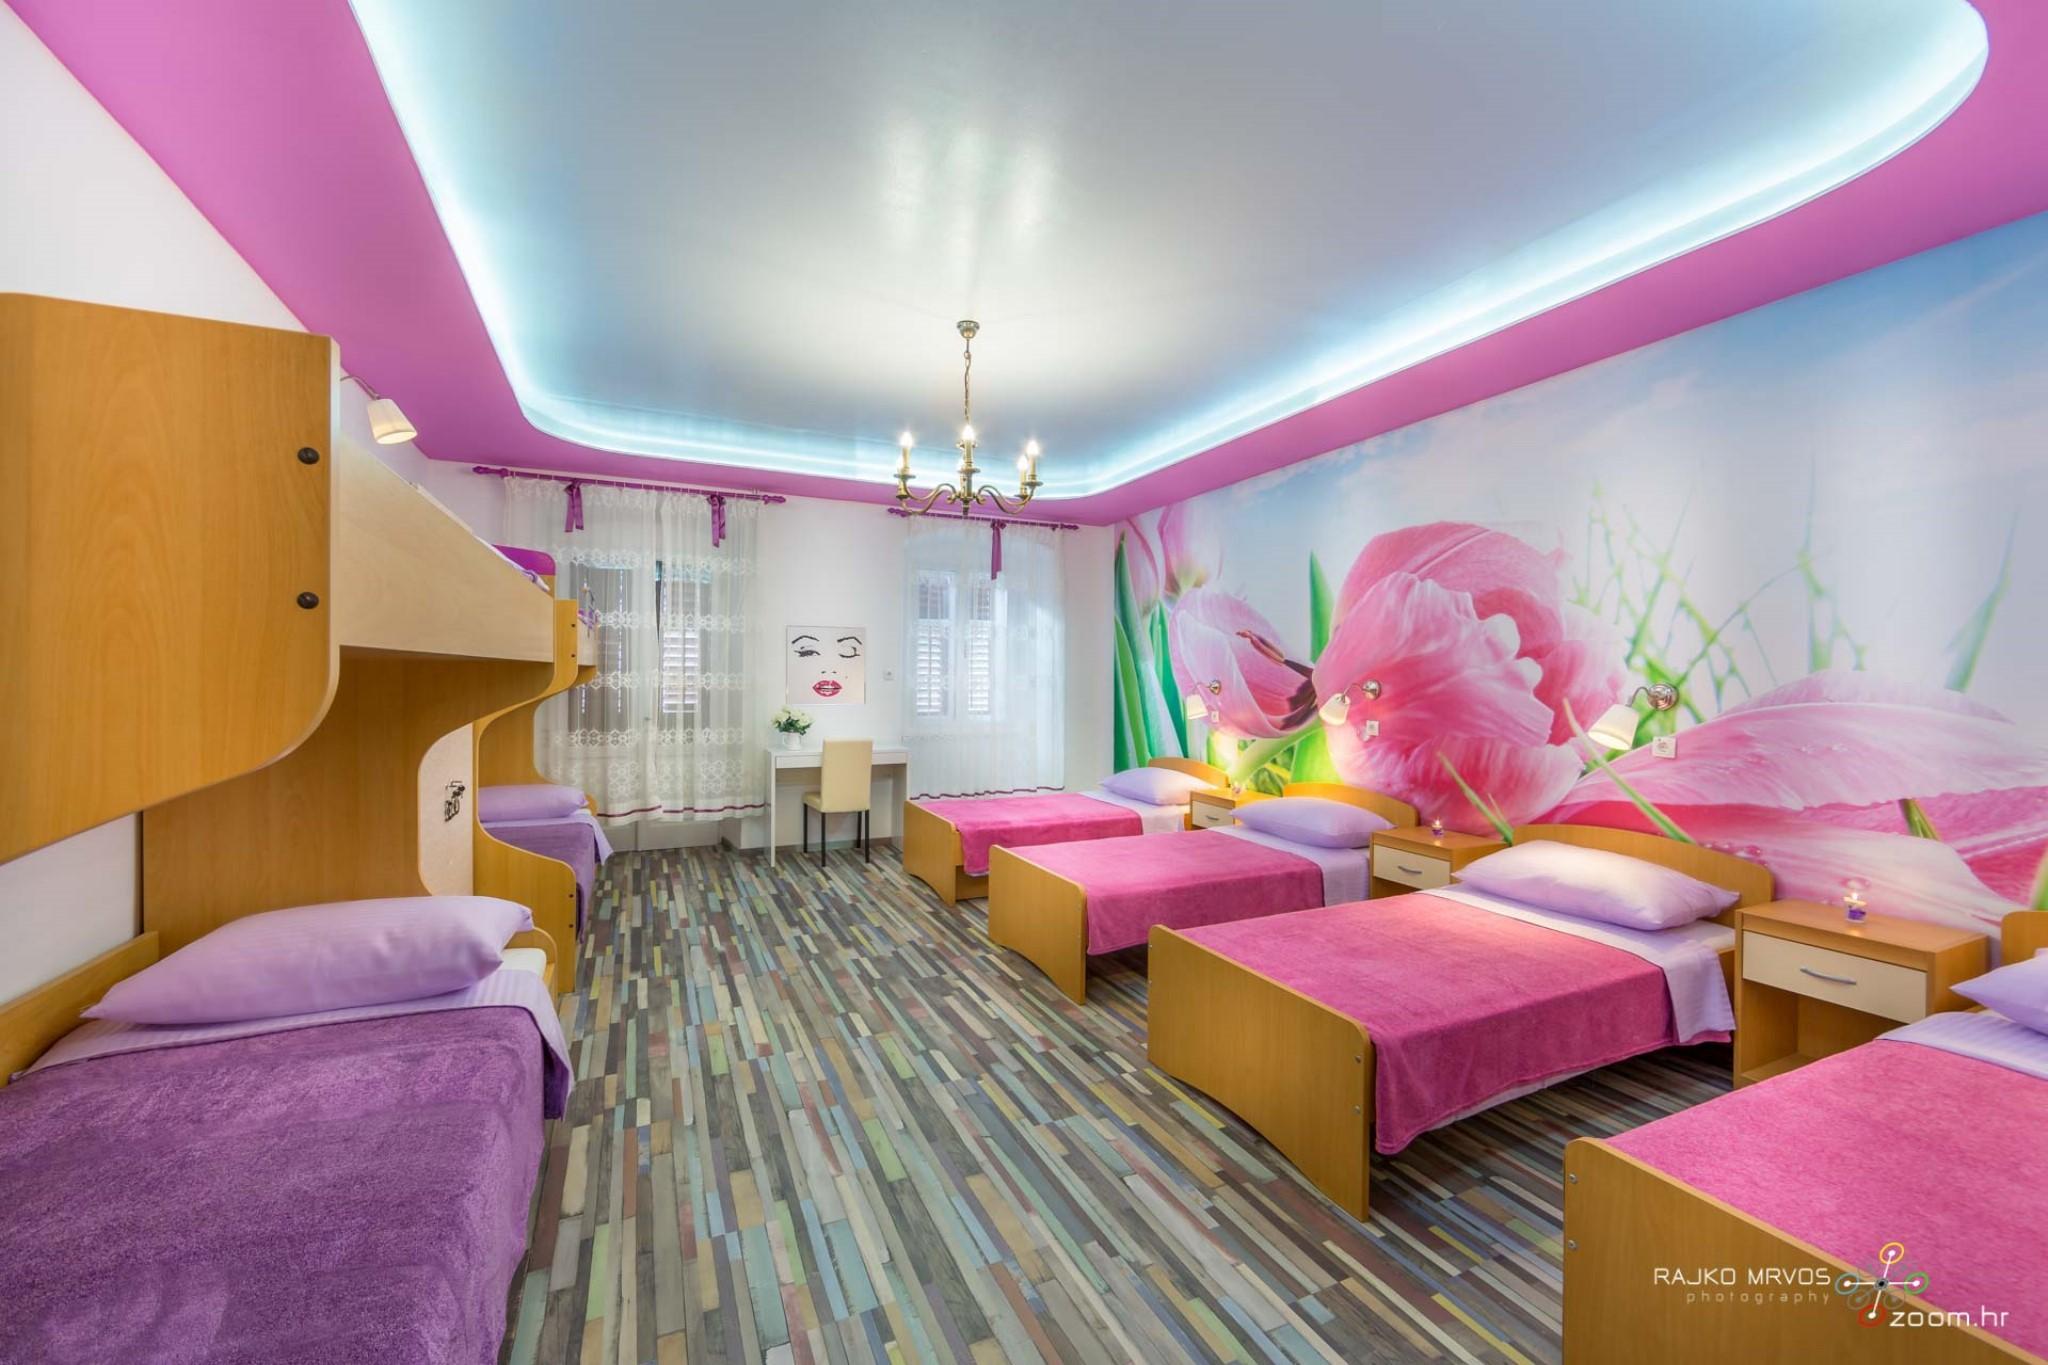 fotografiranje-interijera-fotograf-eksterijera-apartmana-vila-kuca-hostela-Happy-Hostel-1